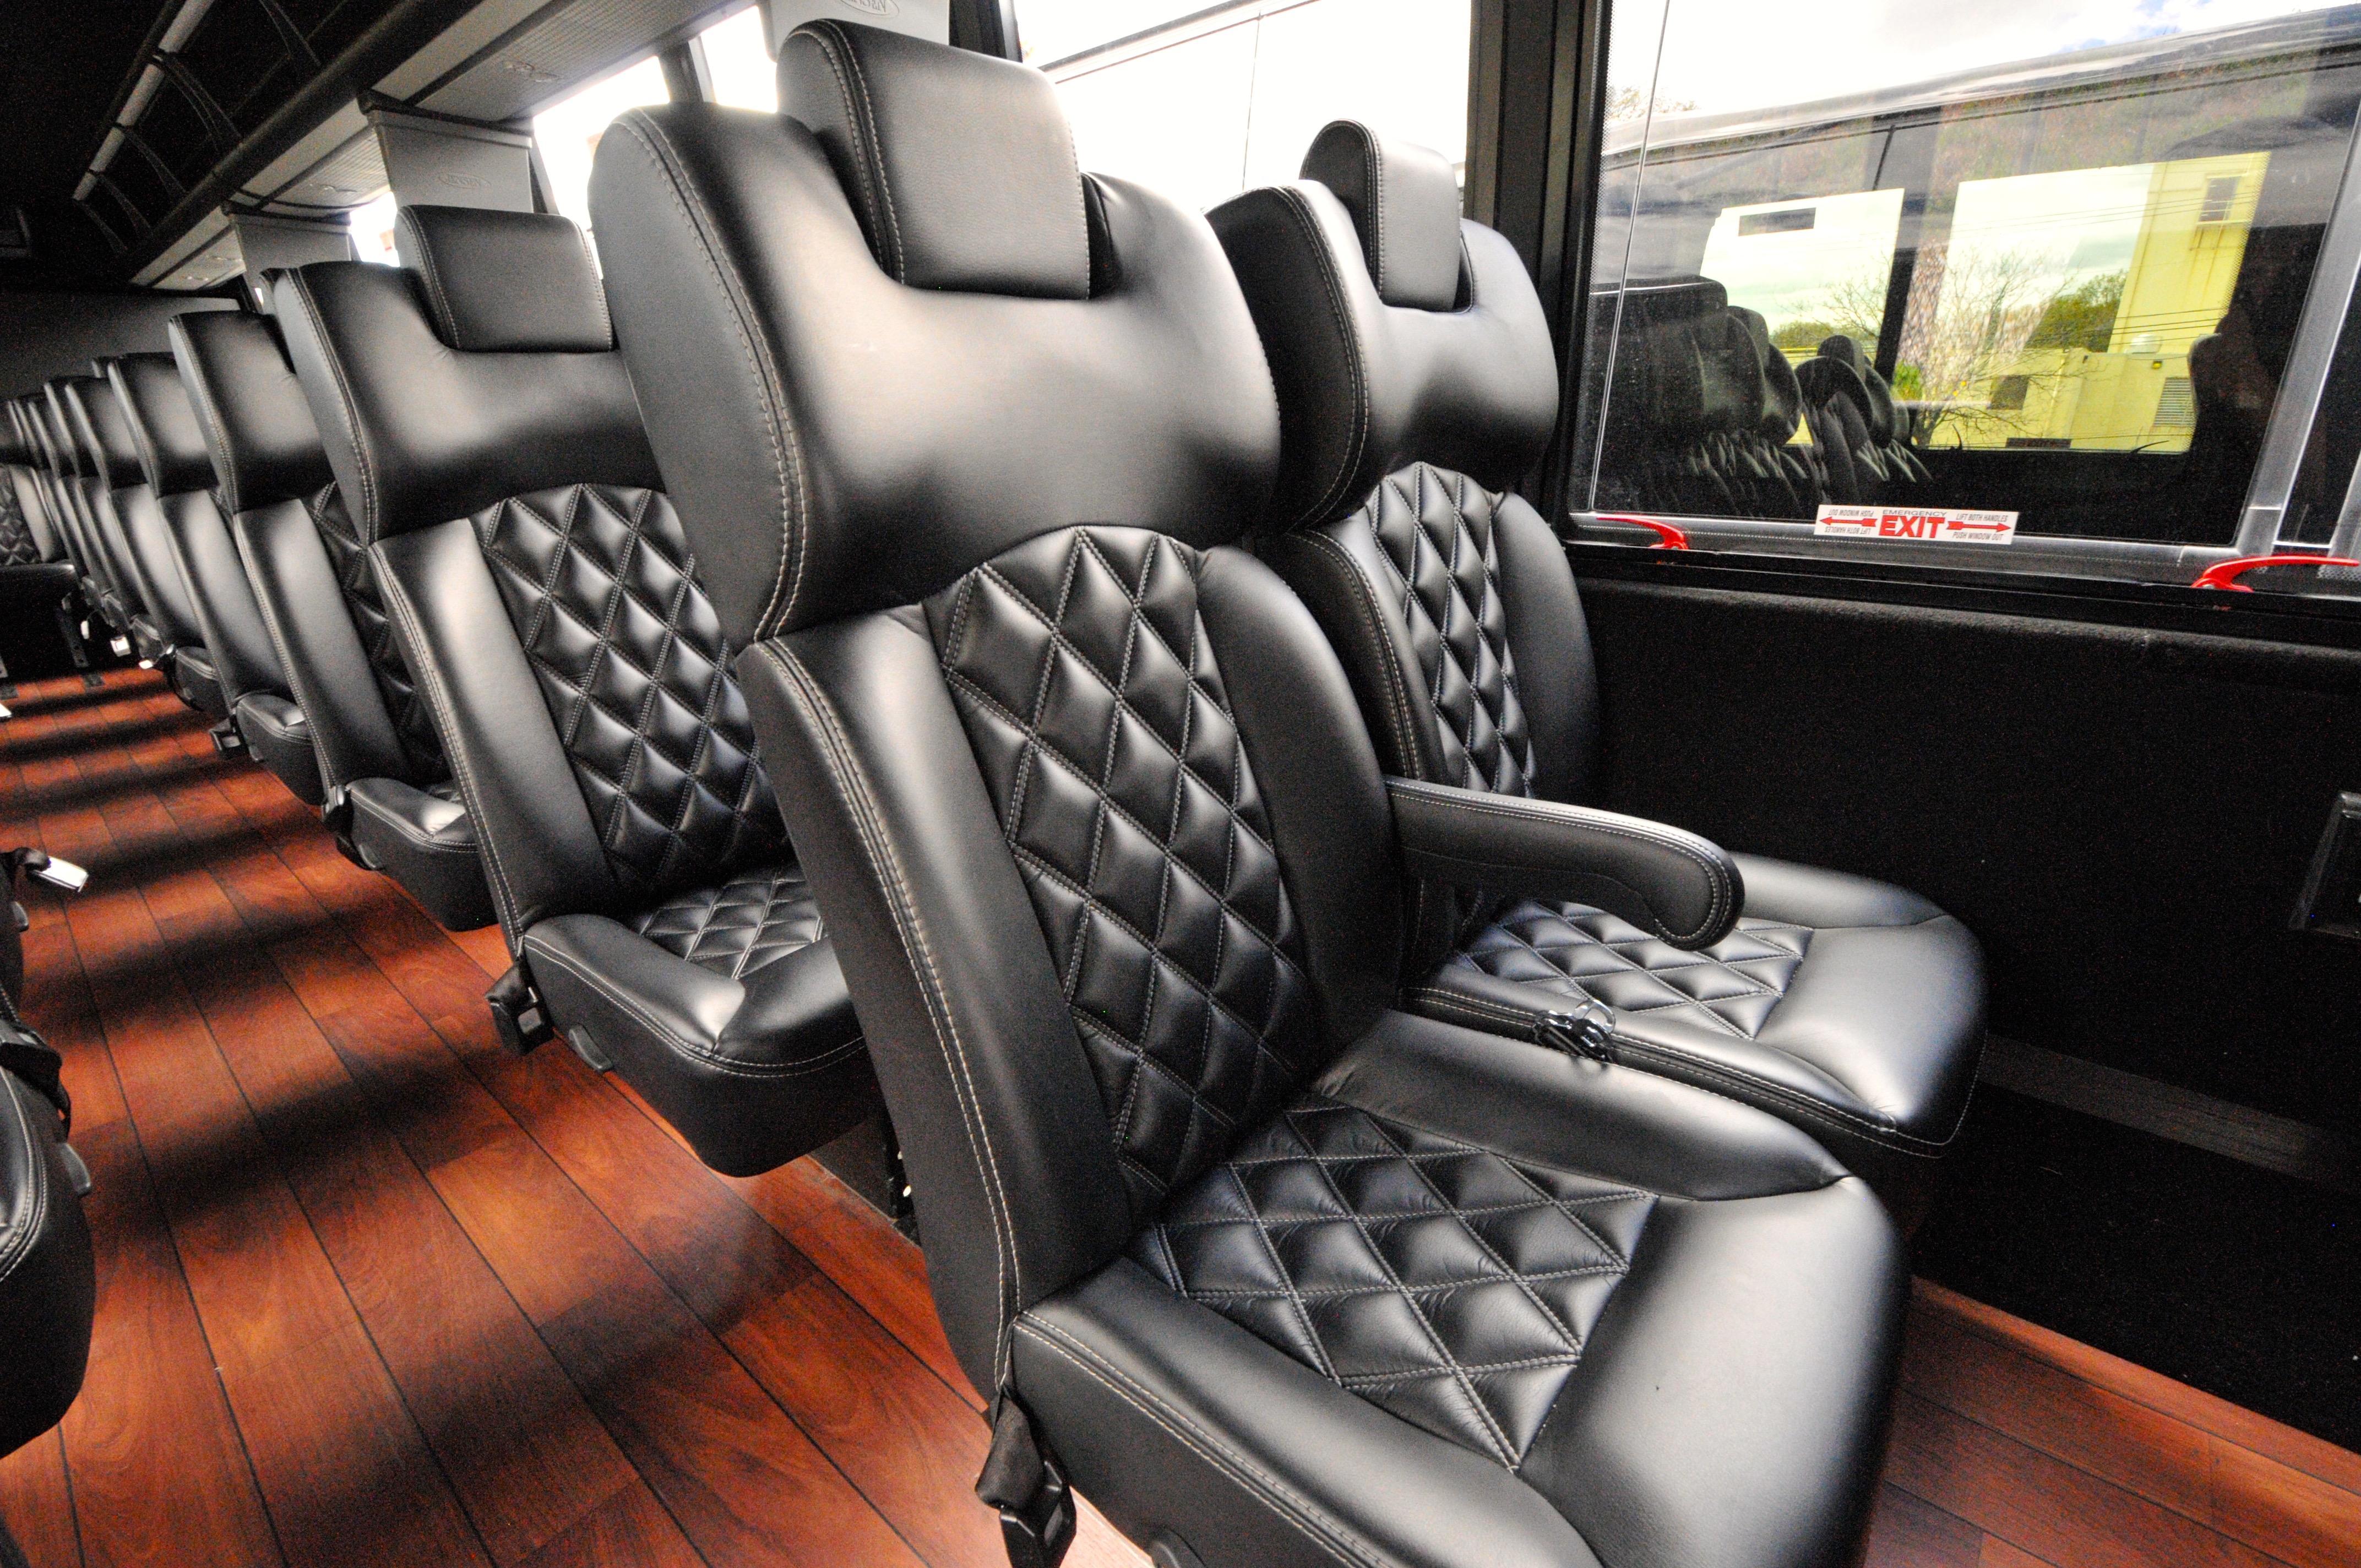 New Jersey Minibus Services Interior